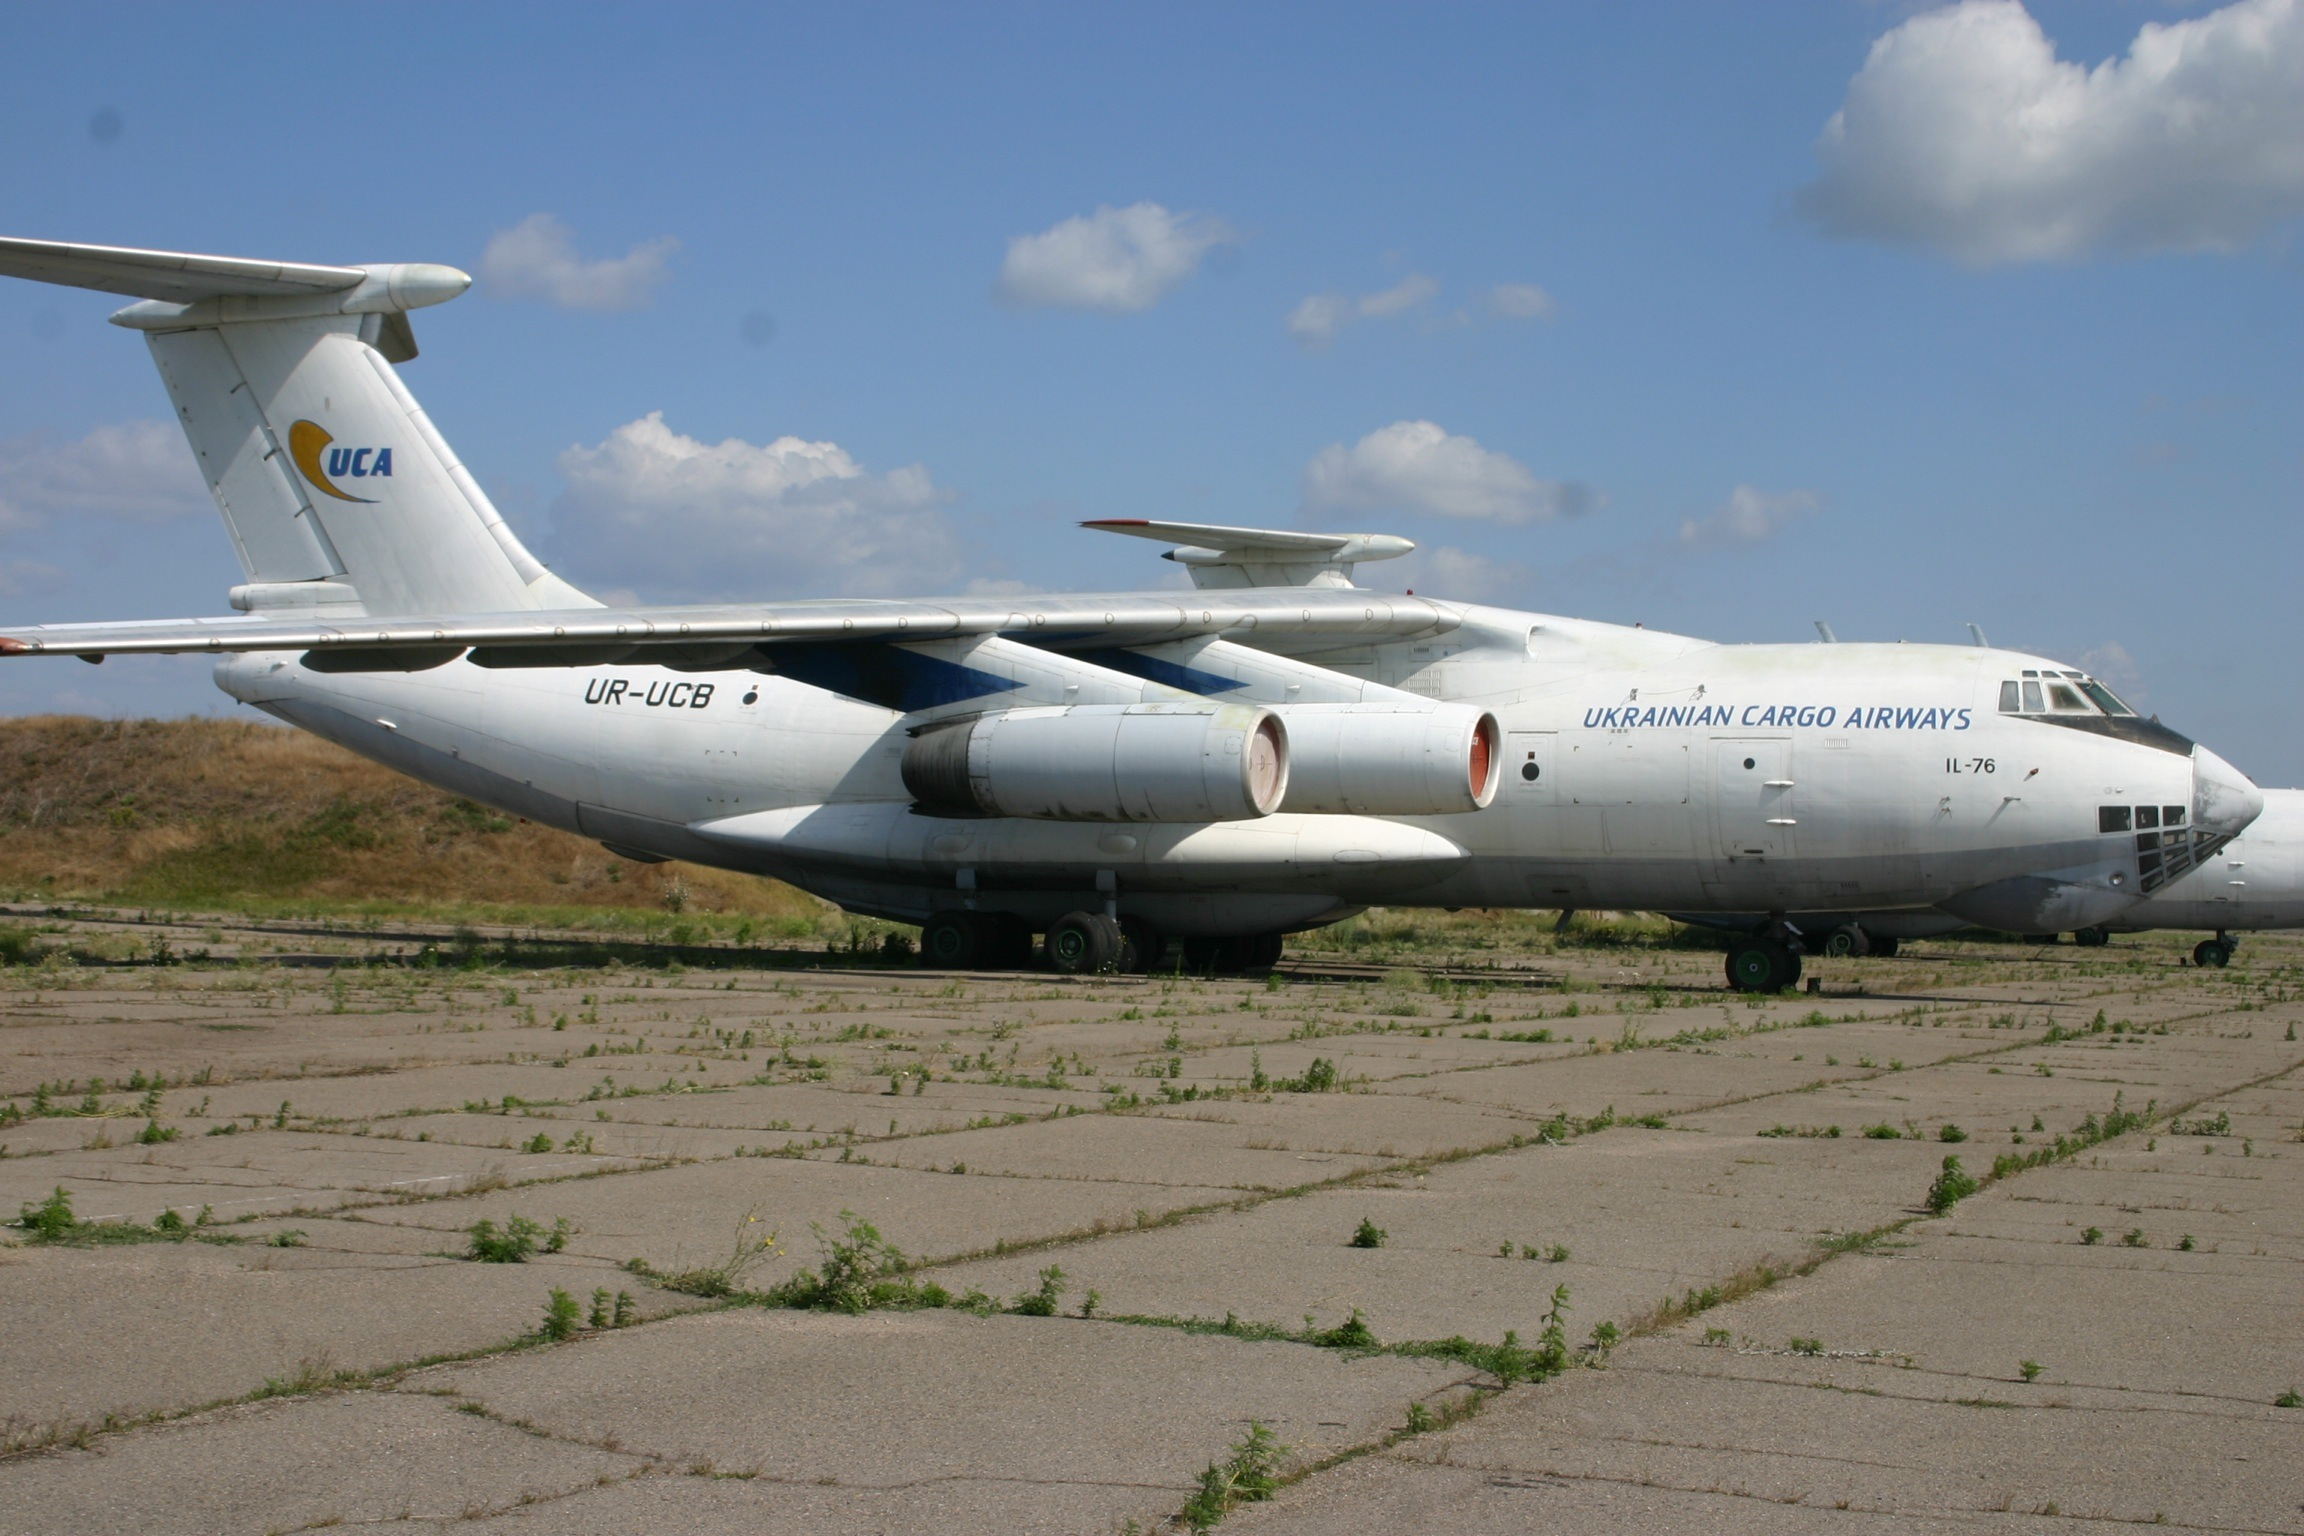 2003 Congo air disaster - Wikipedia